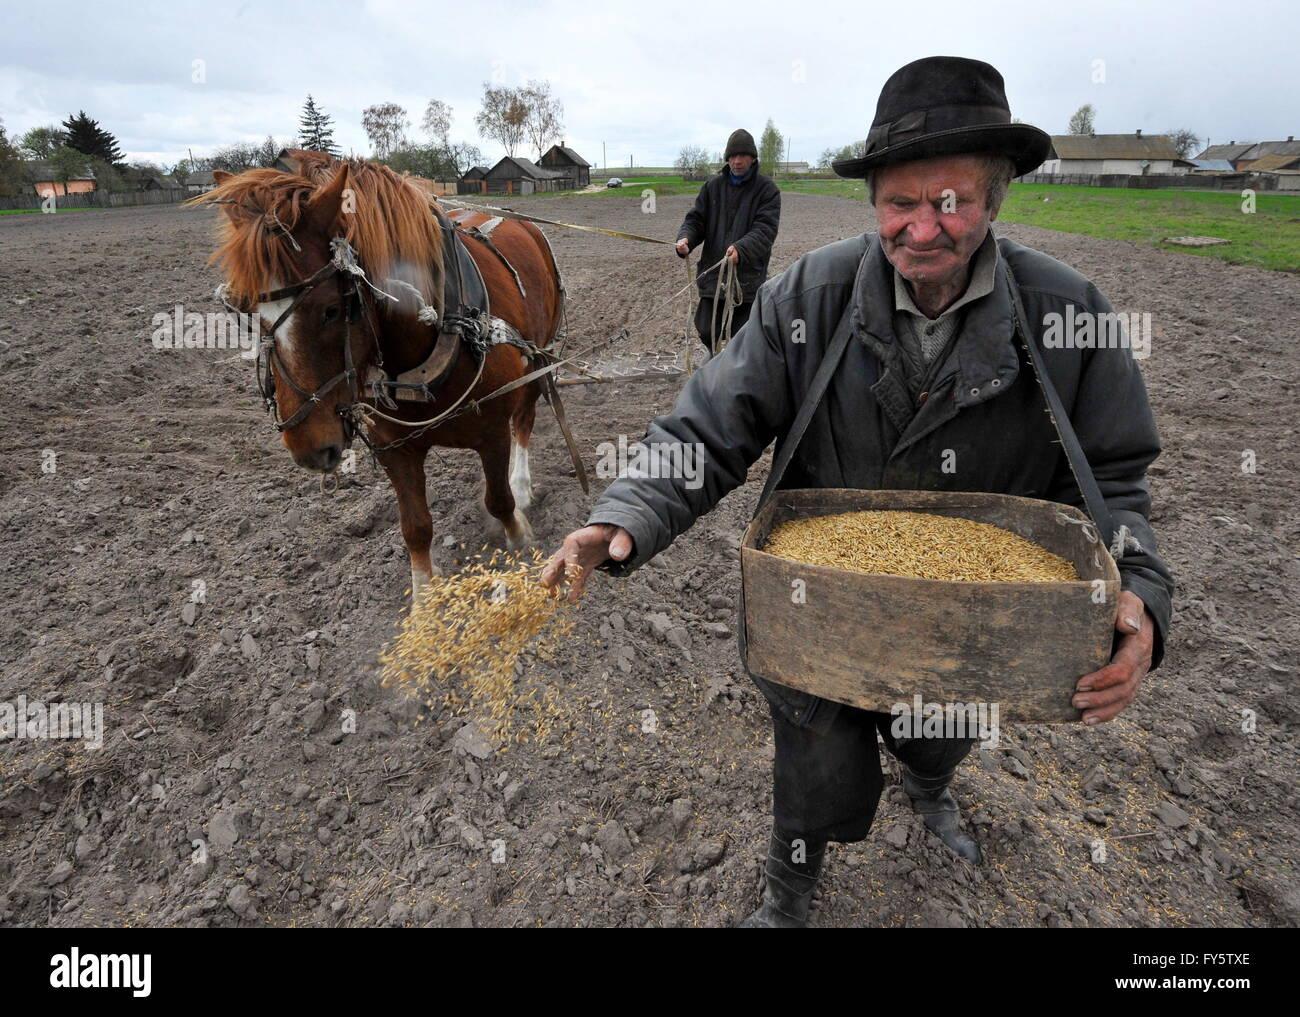 Gomel Region, Belarus. 22nd Apr, 2016. Agricultural works in the village of Novoselki, Khoiniksky District, located - Stock Image